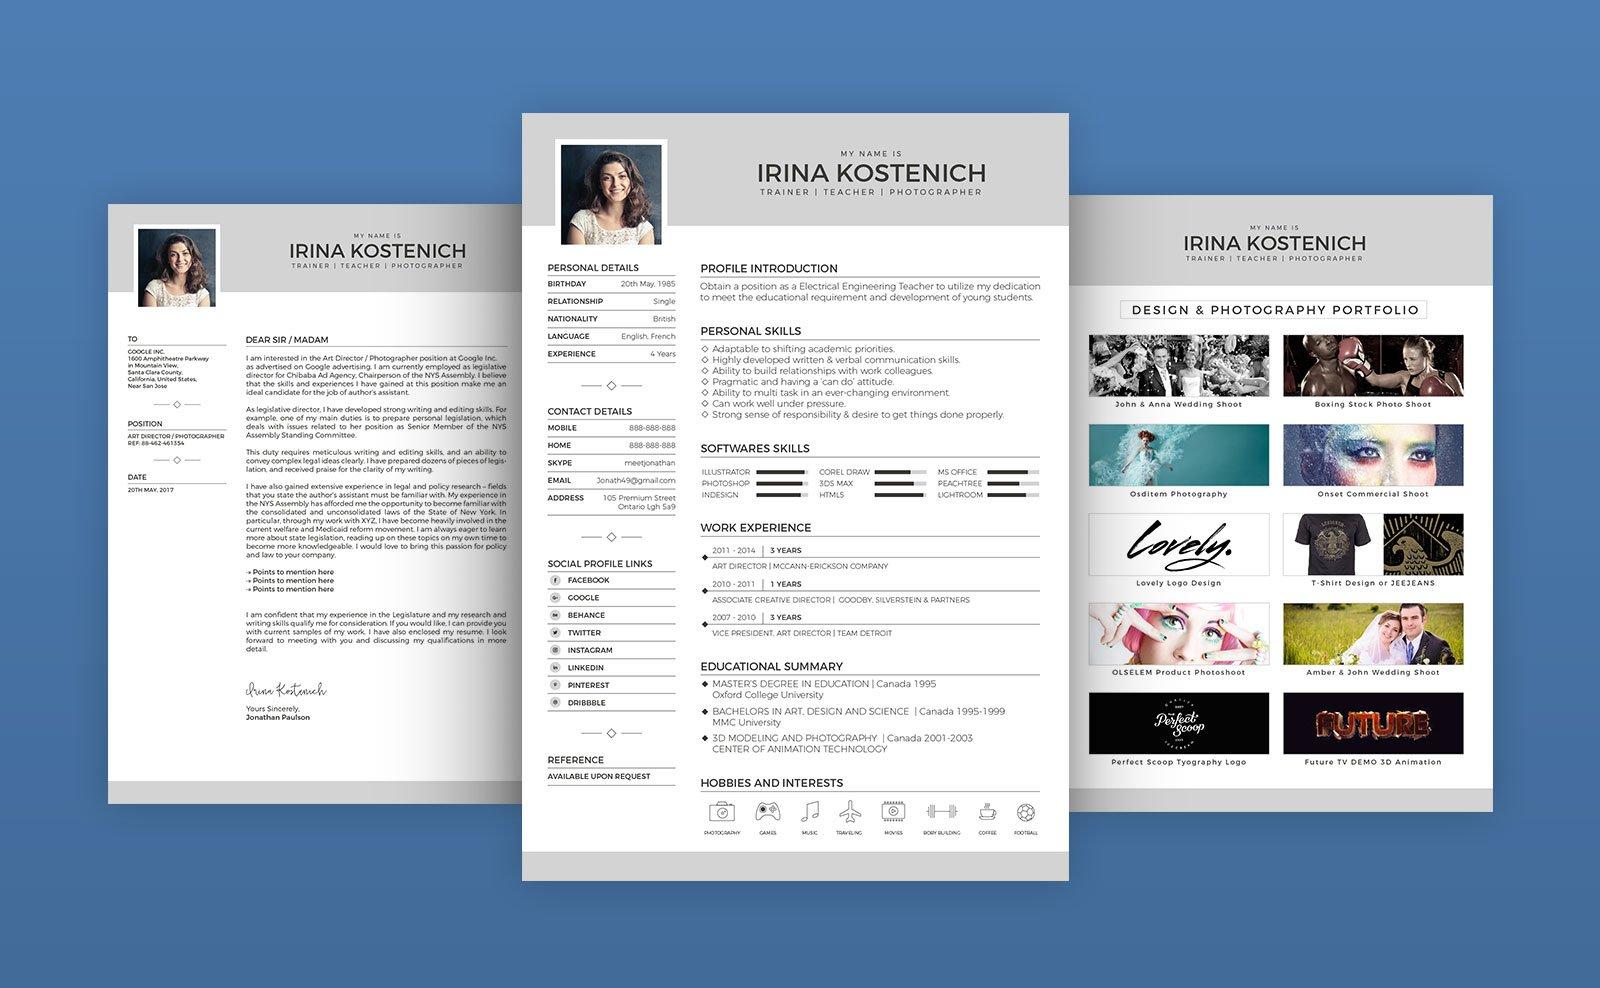 Free-Modern-CV-Template,-Cover-Letter-&-Portfolio-Design-Template-in-Vector-Ai-3